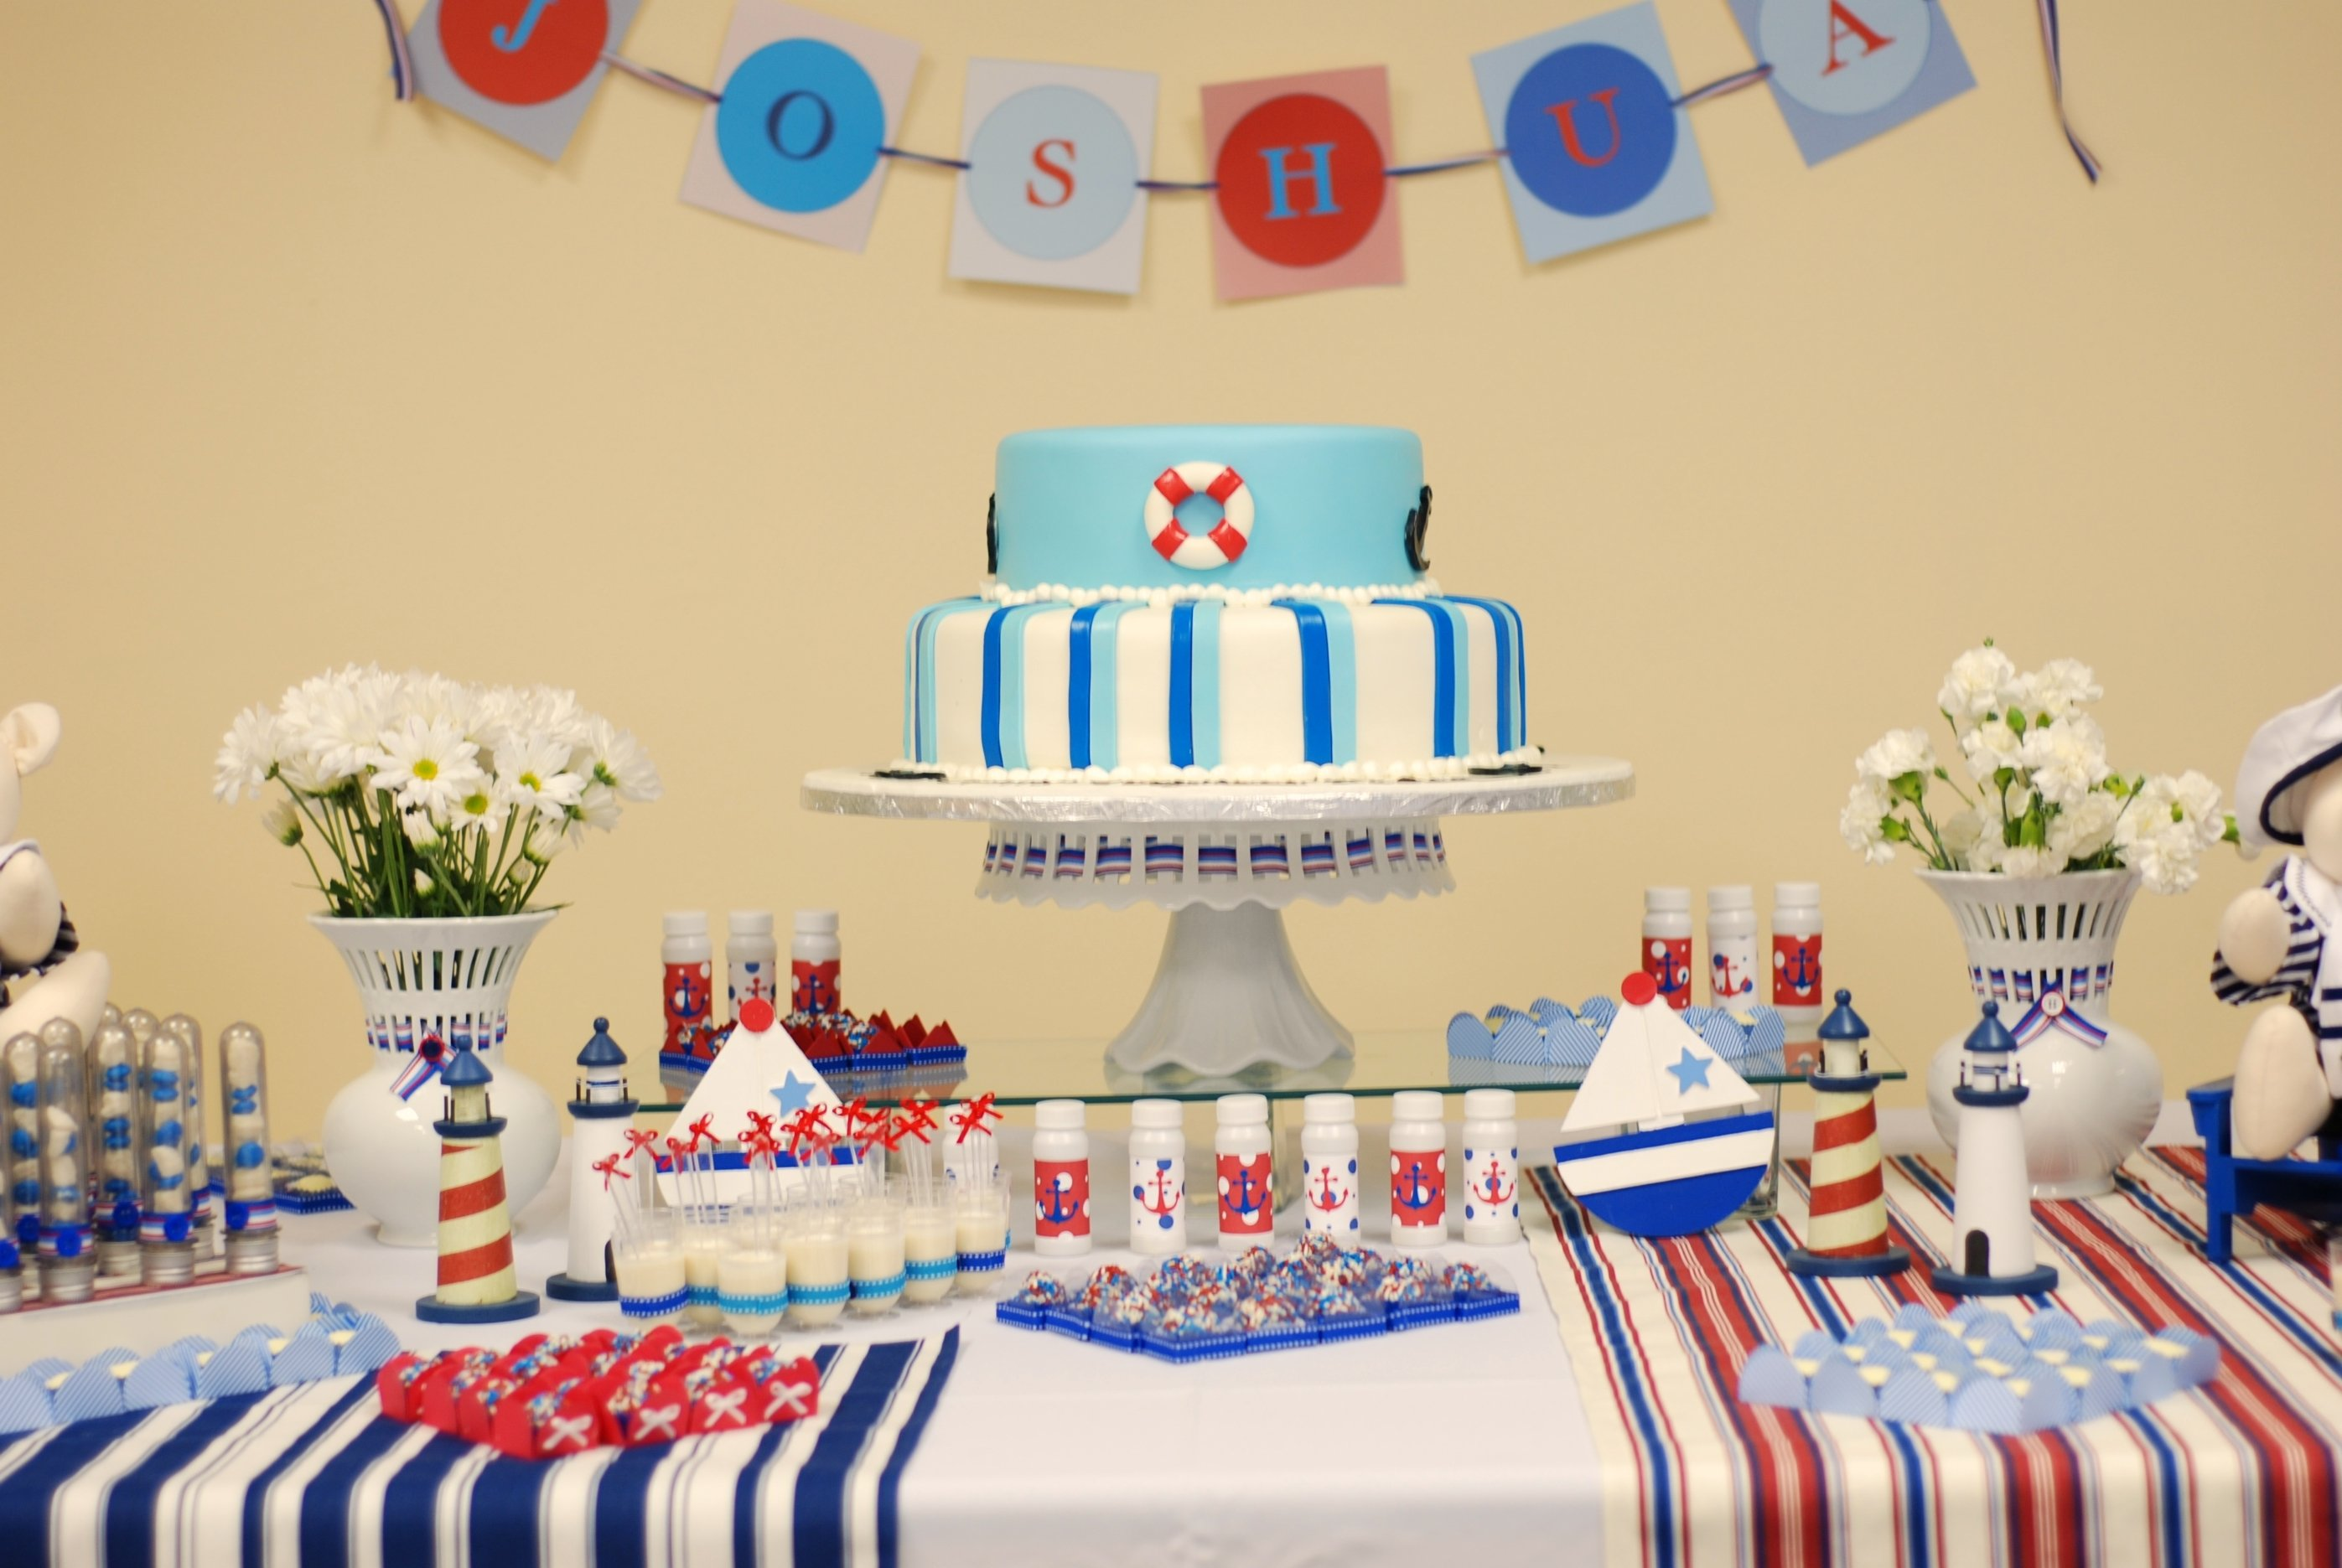 10 Most Popular Unique First Birthday Party Ideas For Boys boys birthday party decoration ideas decorideaz decorideaz 7